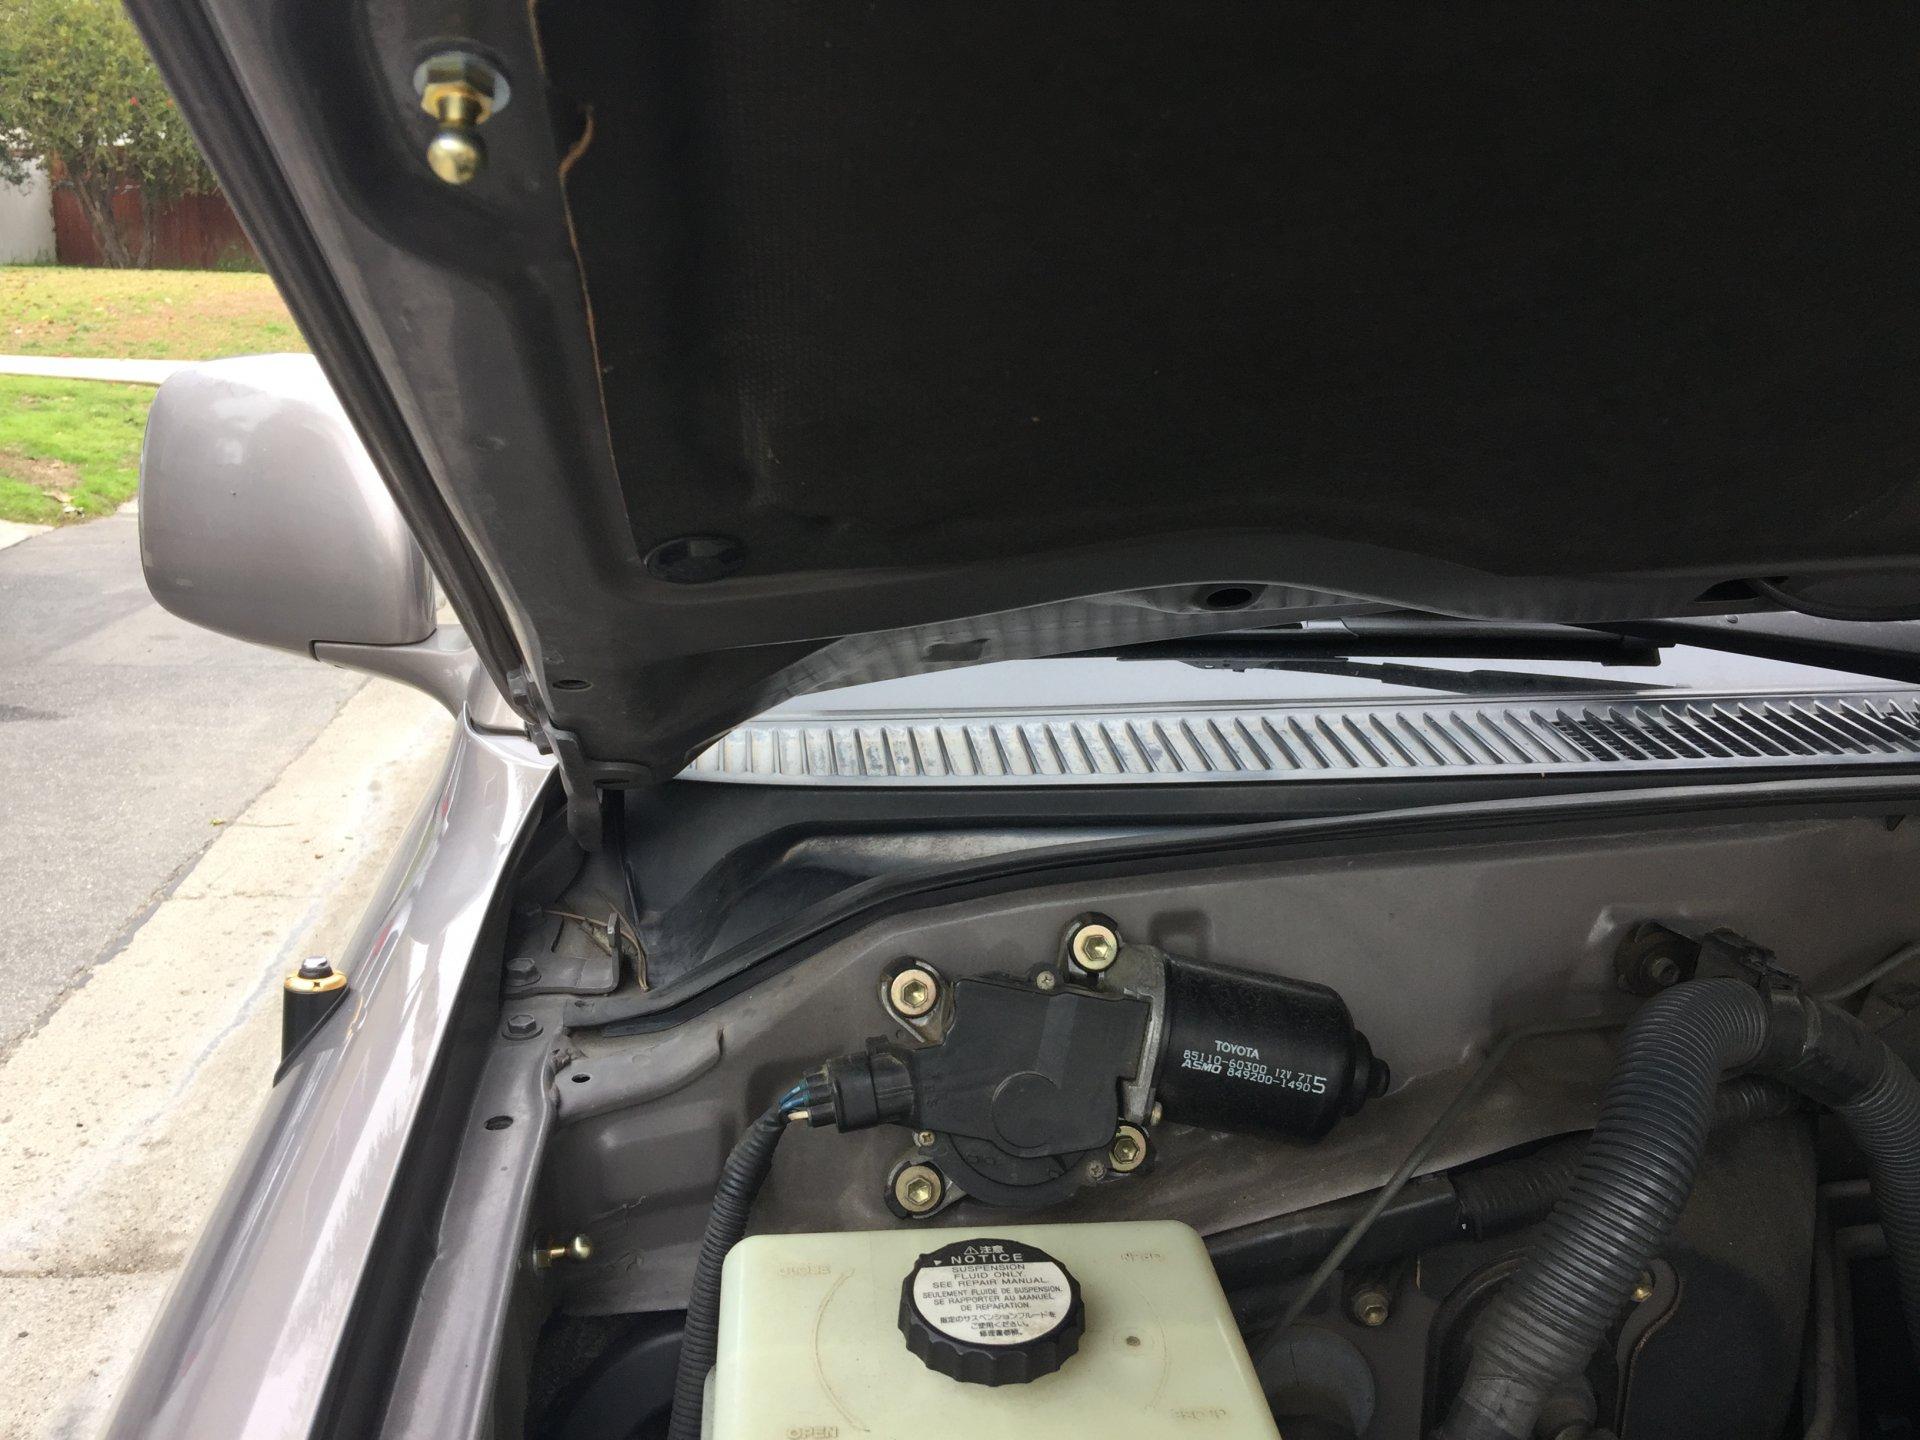 Shocks Cylinders Struts Lexus LX470 1998 To 2004 Hood Lift Supports 2 StrongArm 4361 Toyota Land Cruiser Qty